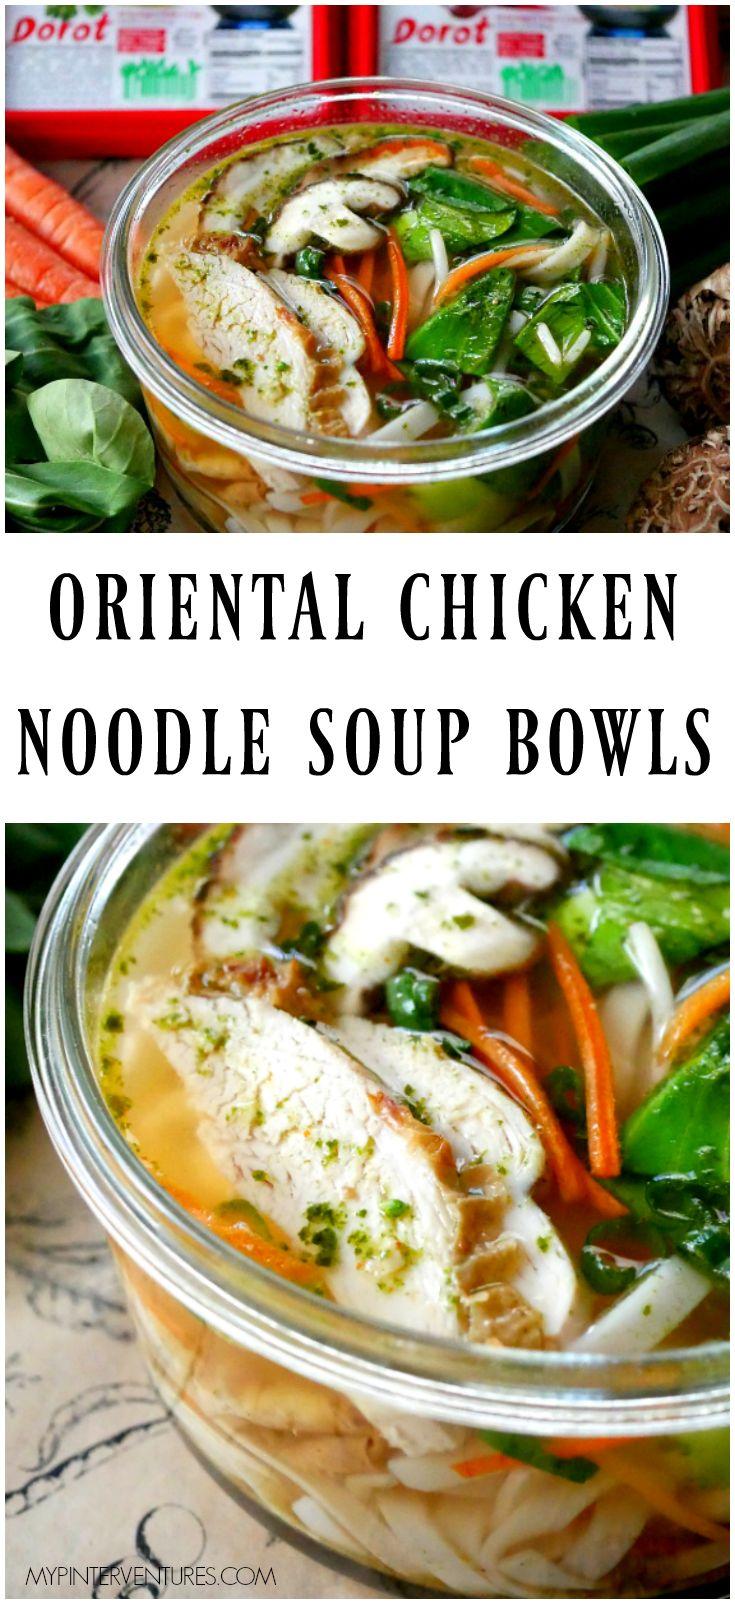 Individual Oriental Chicken Noodle Soup Bowls